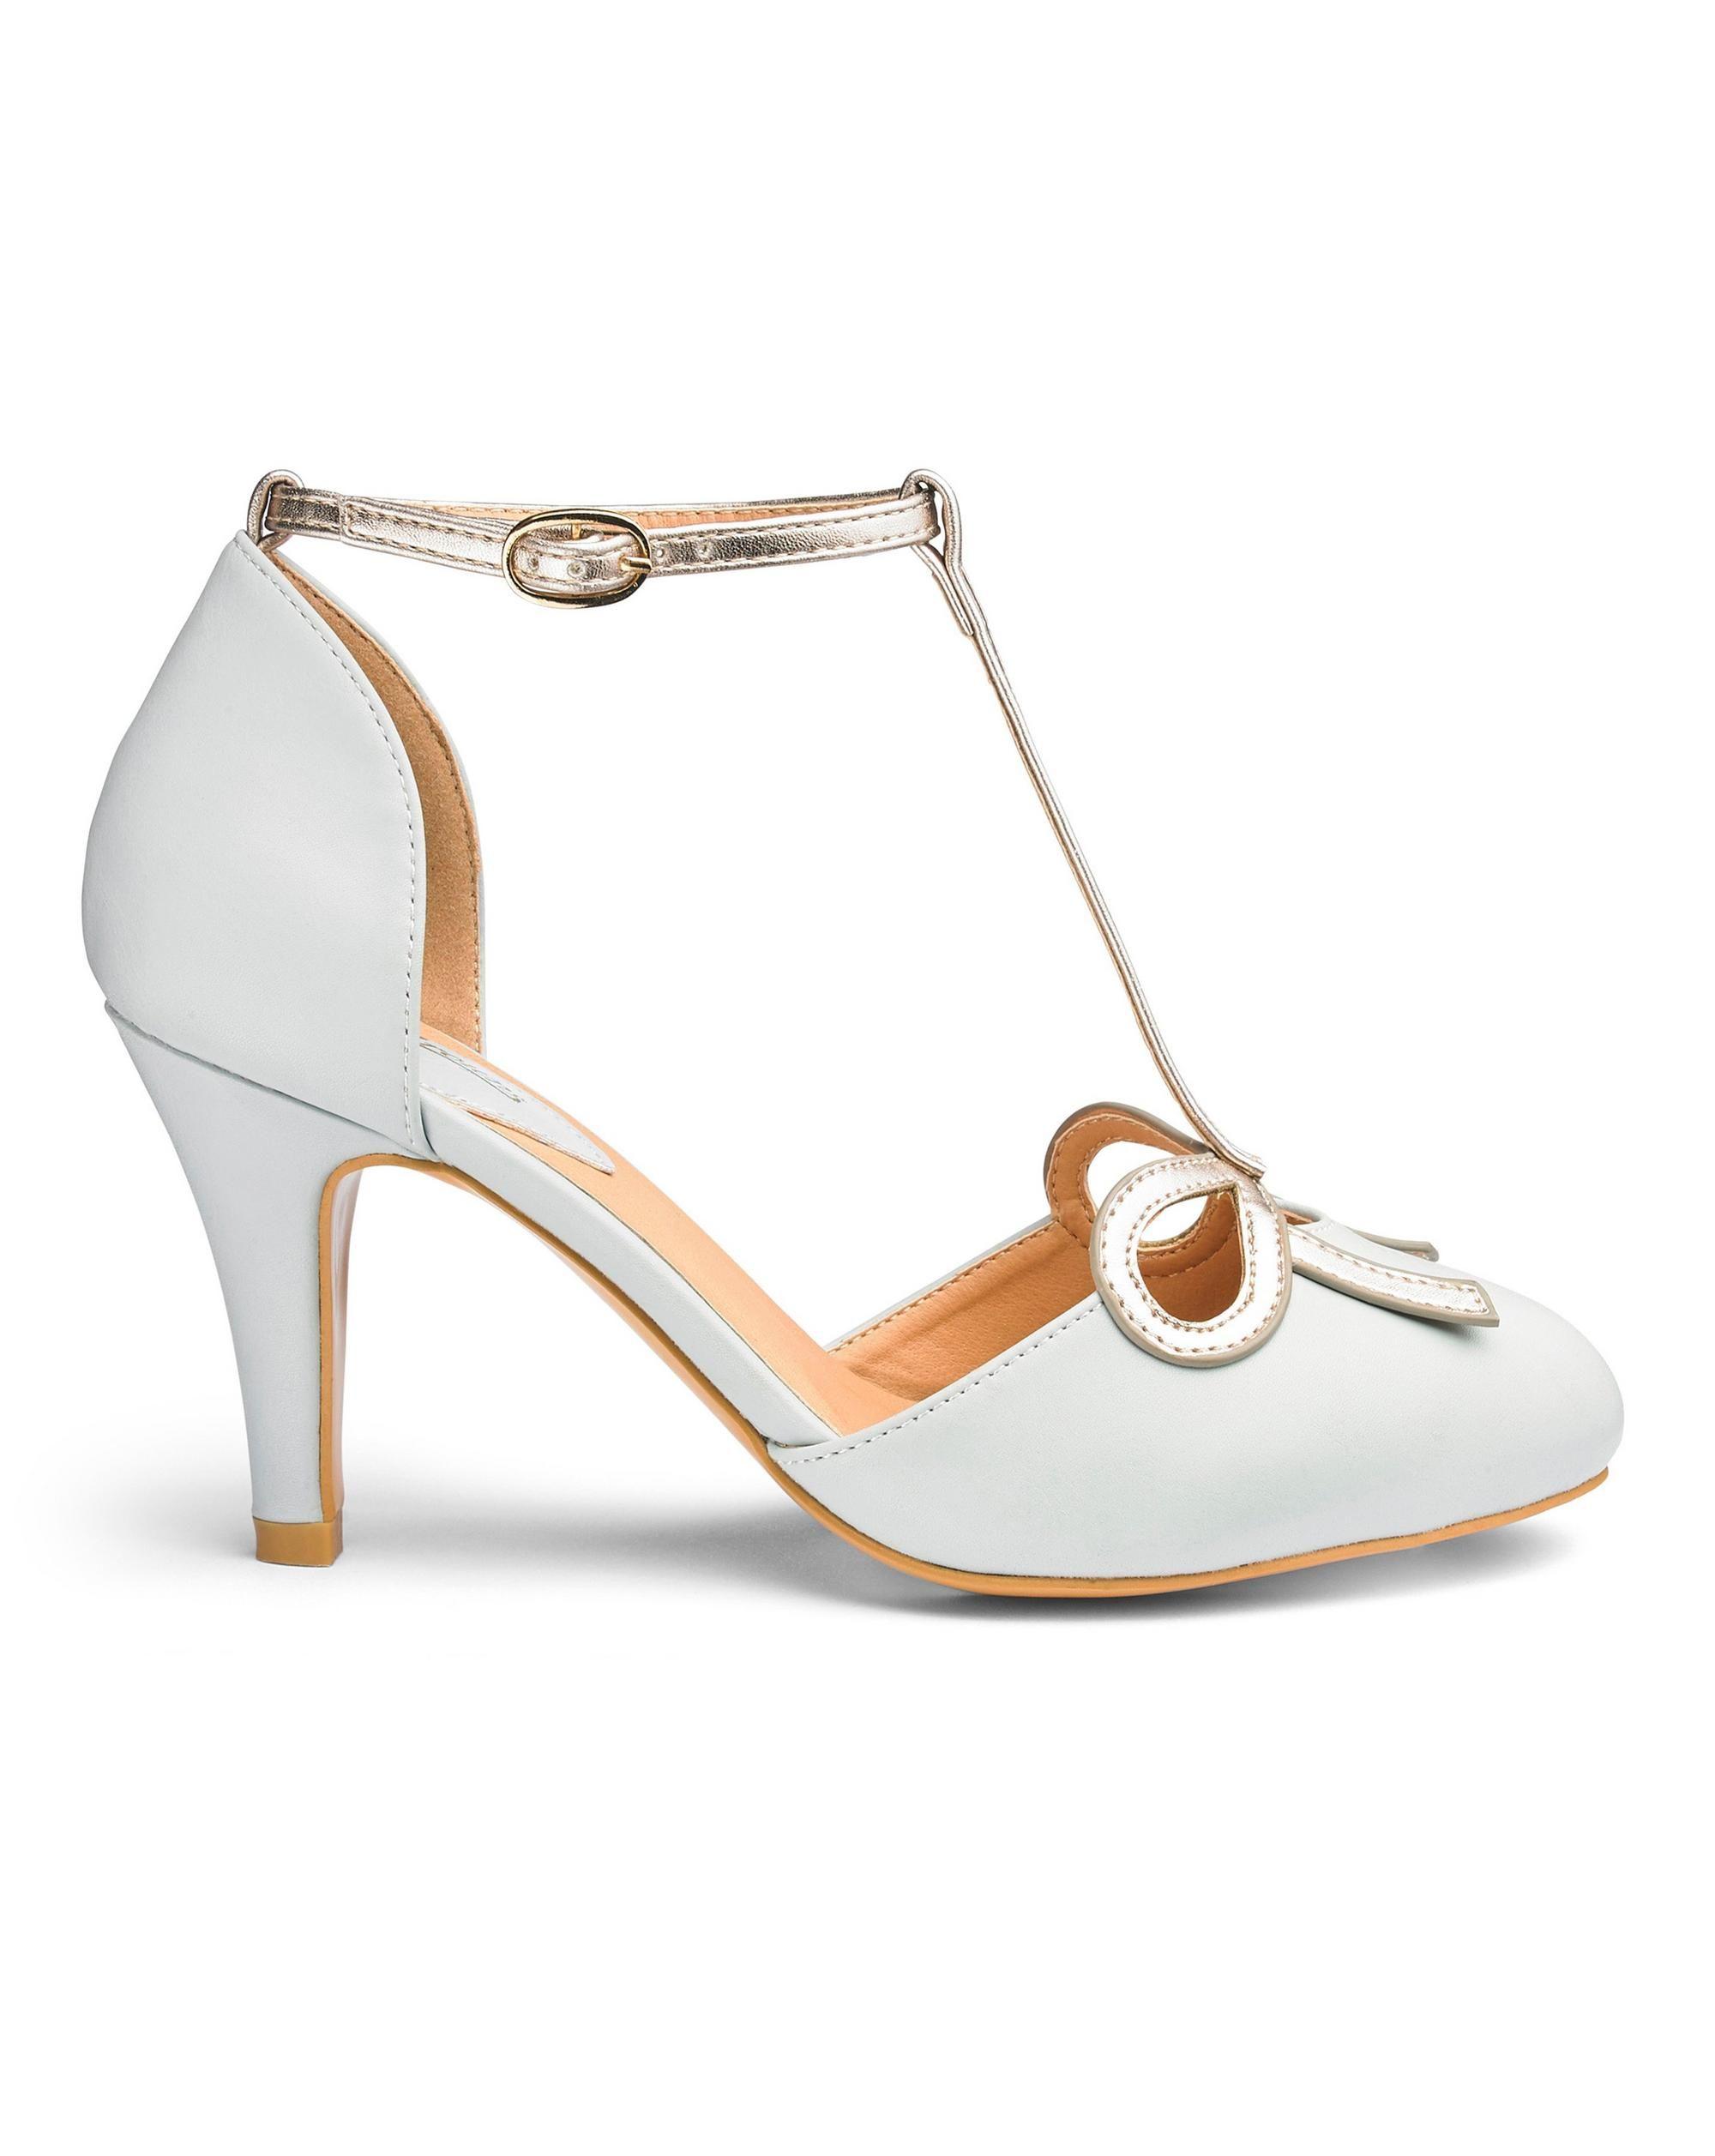 1920s Style Shoes Joe Browns Pumps 52 49 At Vintagedancer Com Vintage Style Shoes Vintage Inspired Shoes Fashion Shoes